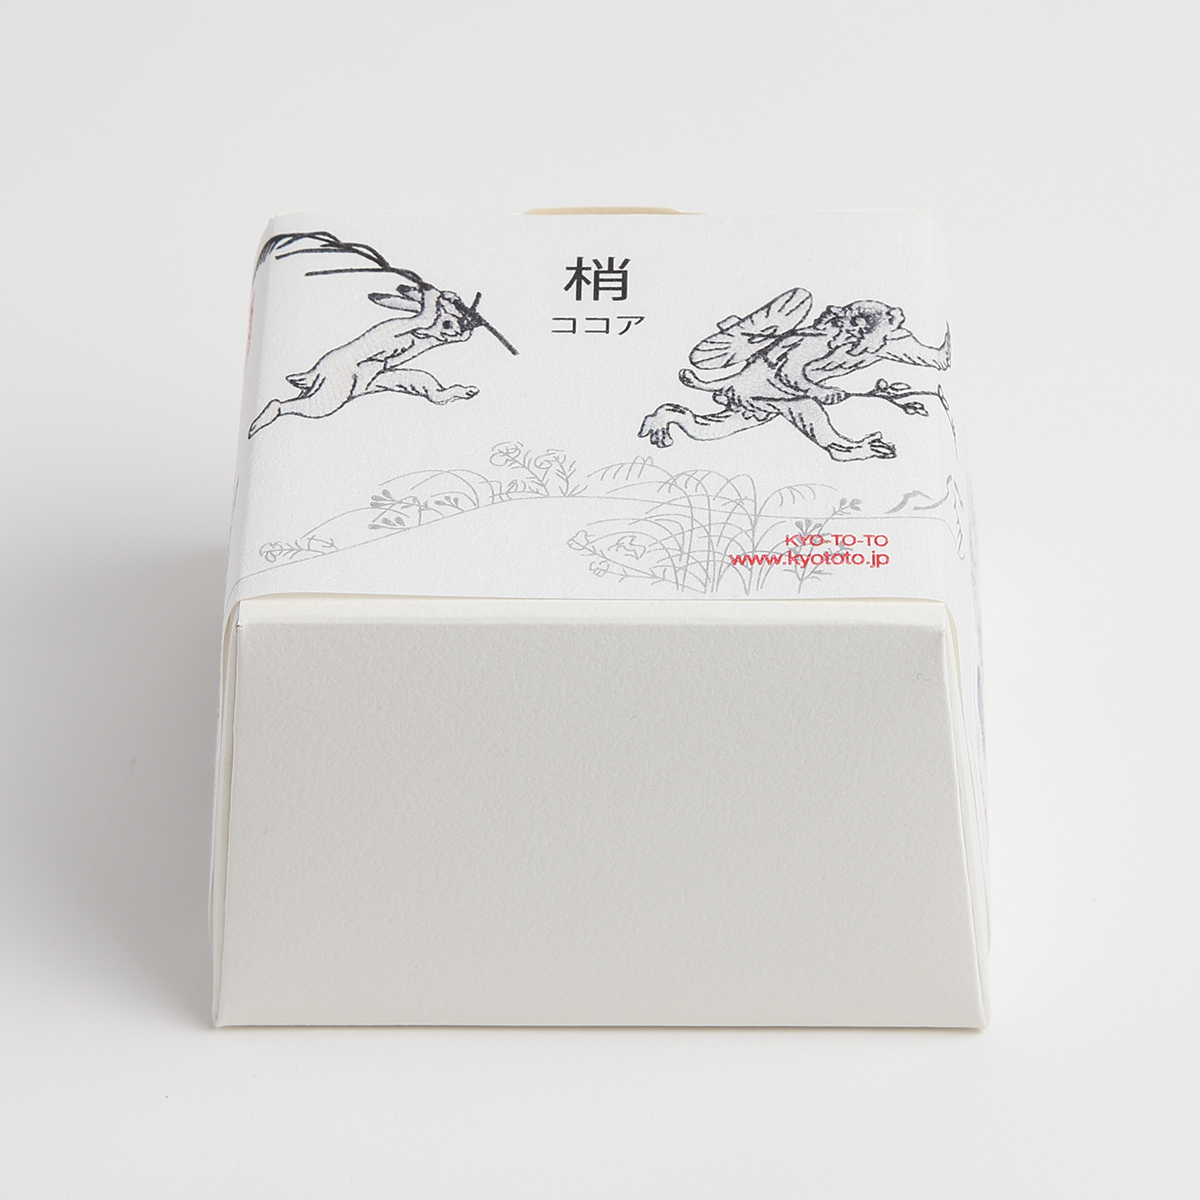 KY03-881C/チョコレート菓子/ココア